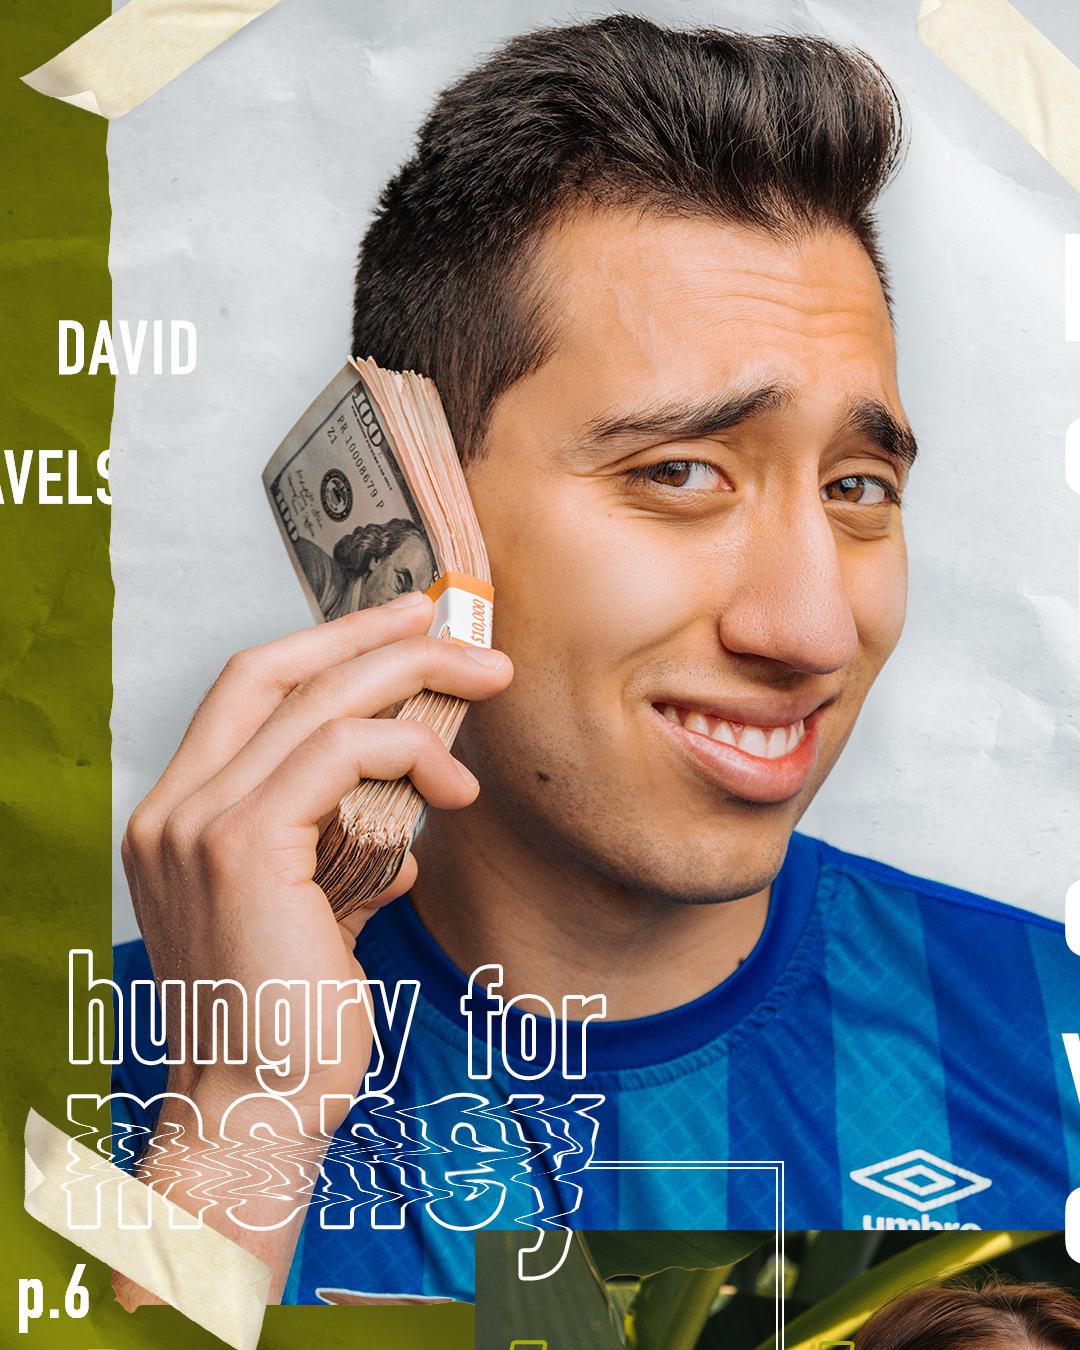 David final final.jpg